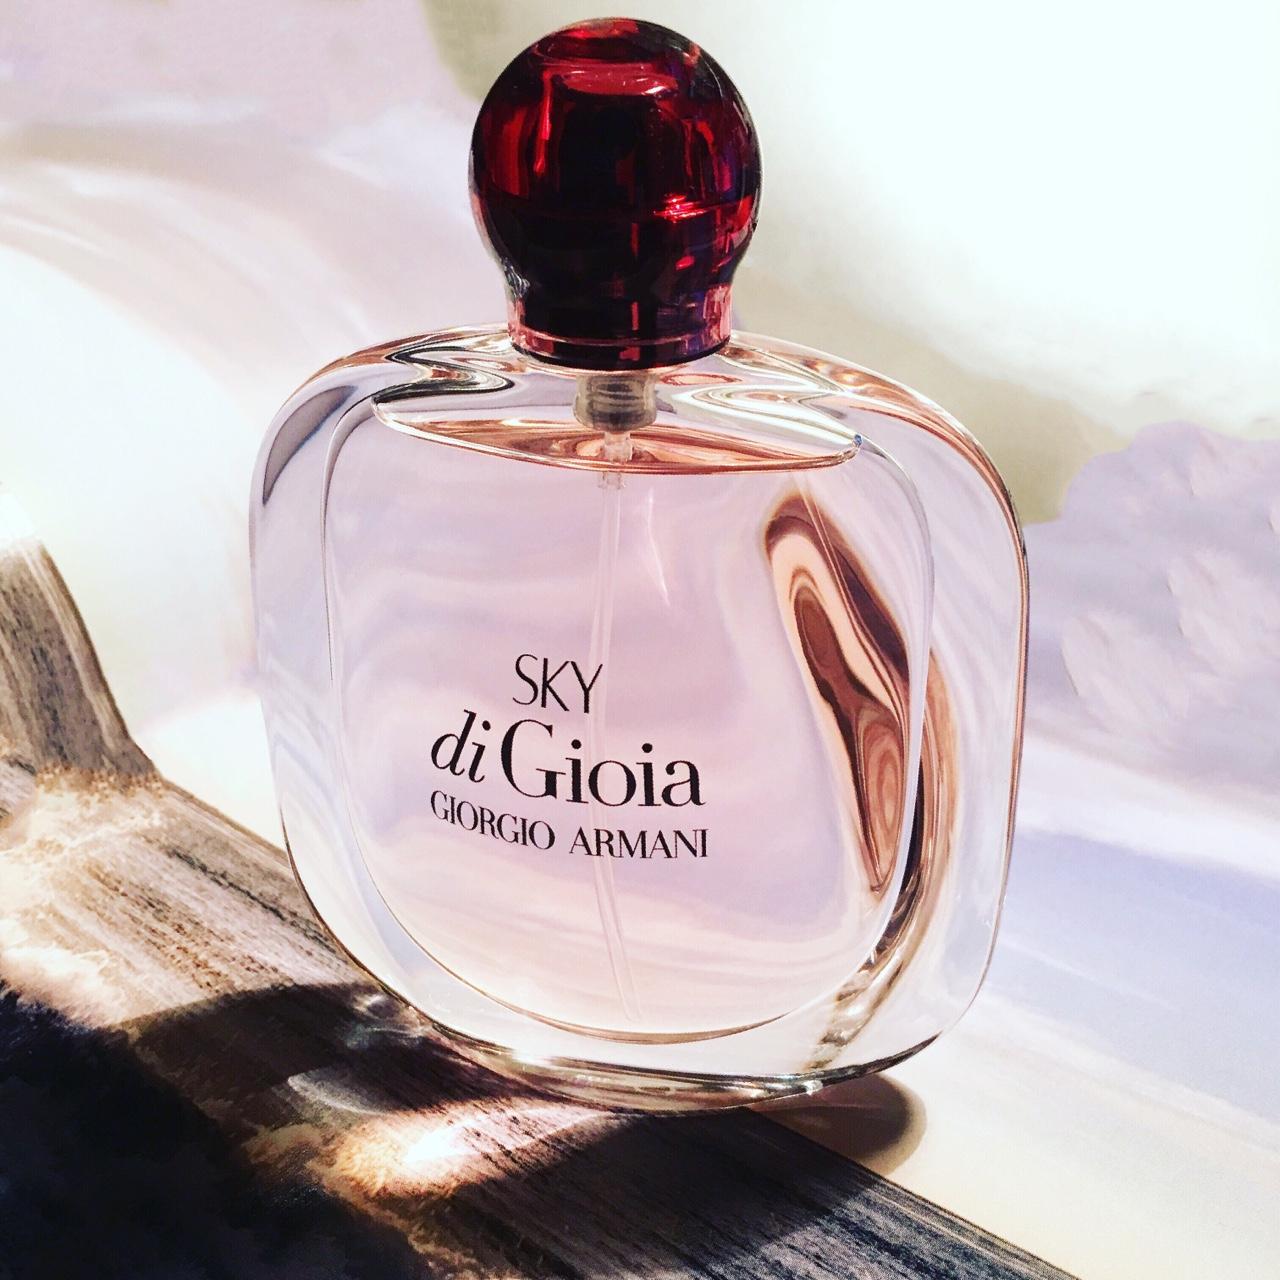 картинки парфюма от армани меньше зазоры, тем